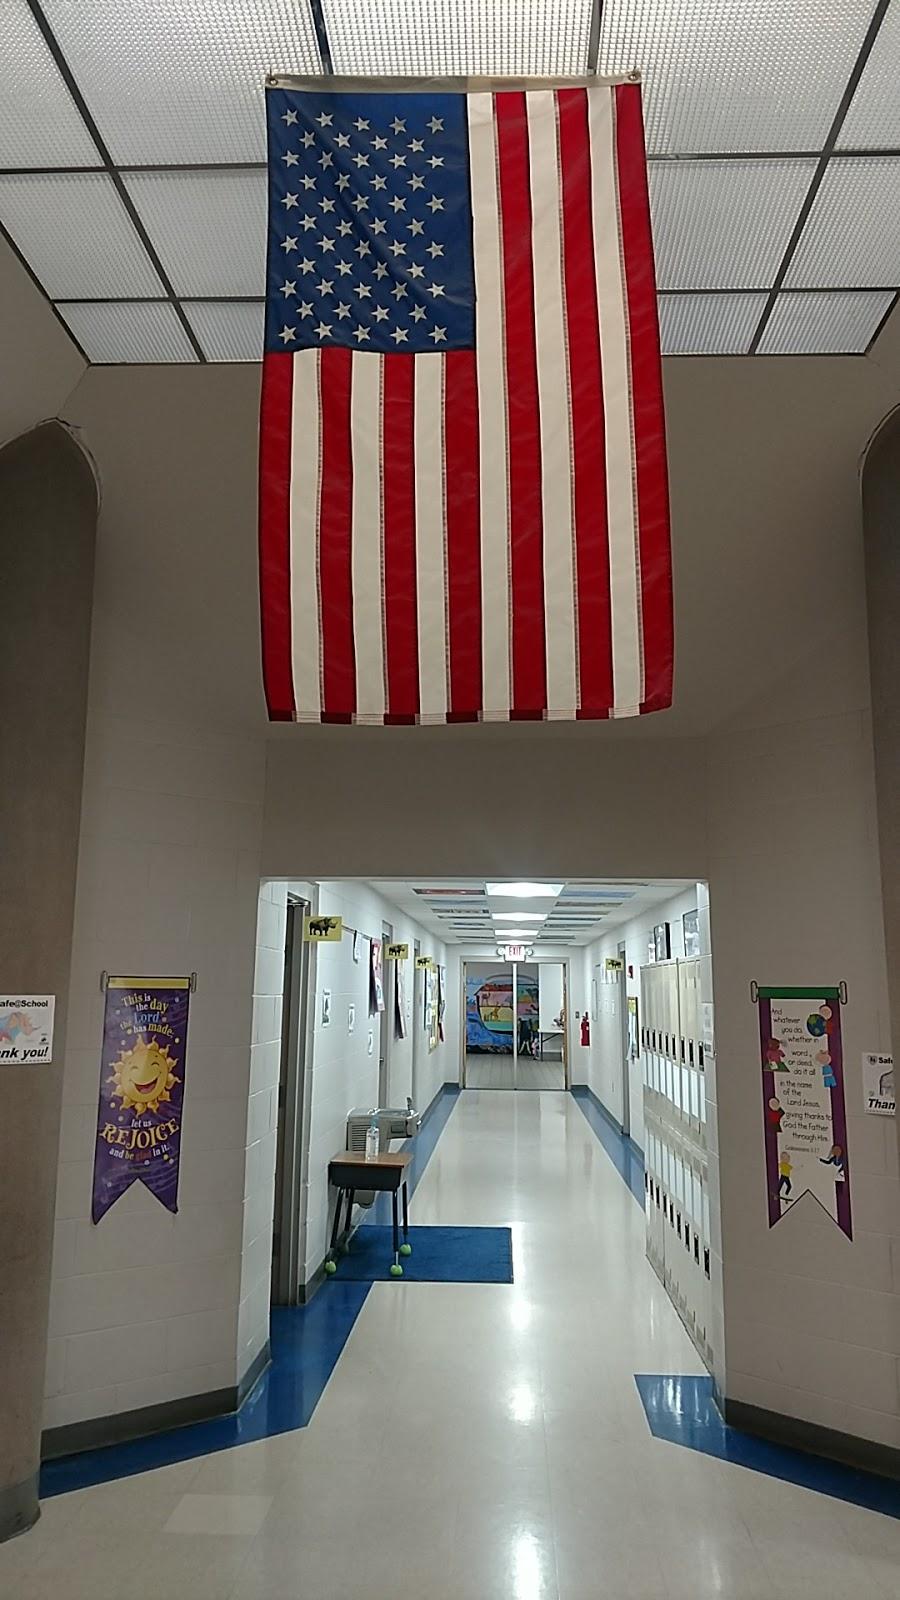 Gorman Christian Academy - school  | Photo 5 of 6 | Address: 3311 E Geer St, Durham, NC 27704, USA | Phone: (919) 688-2567